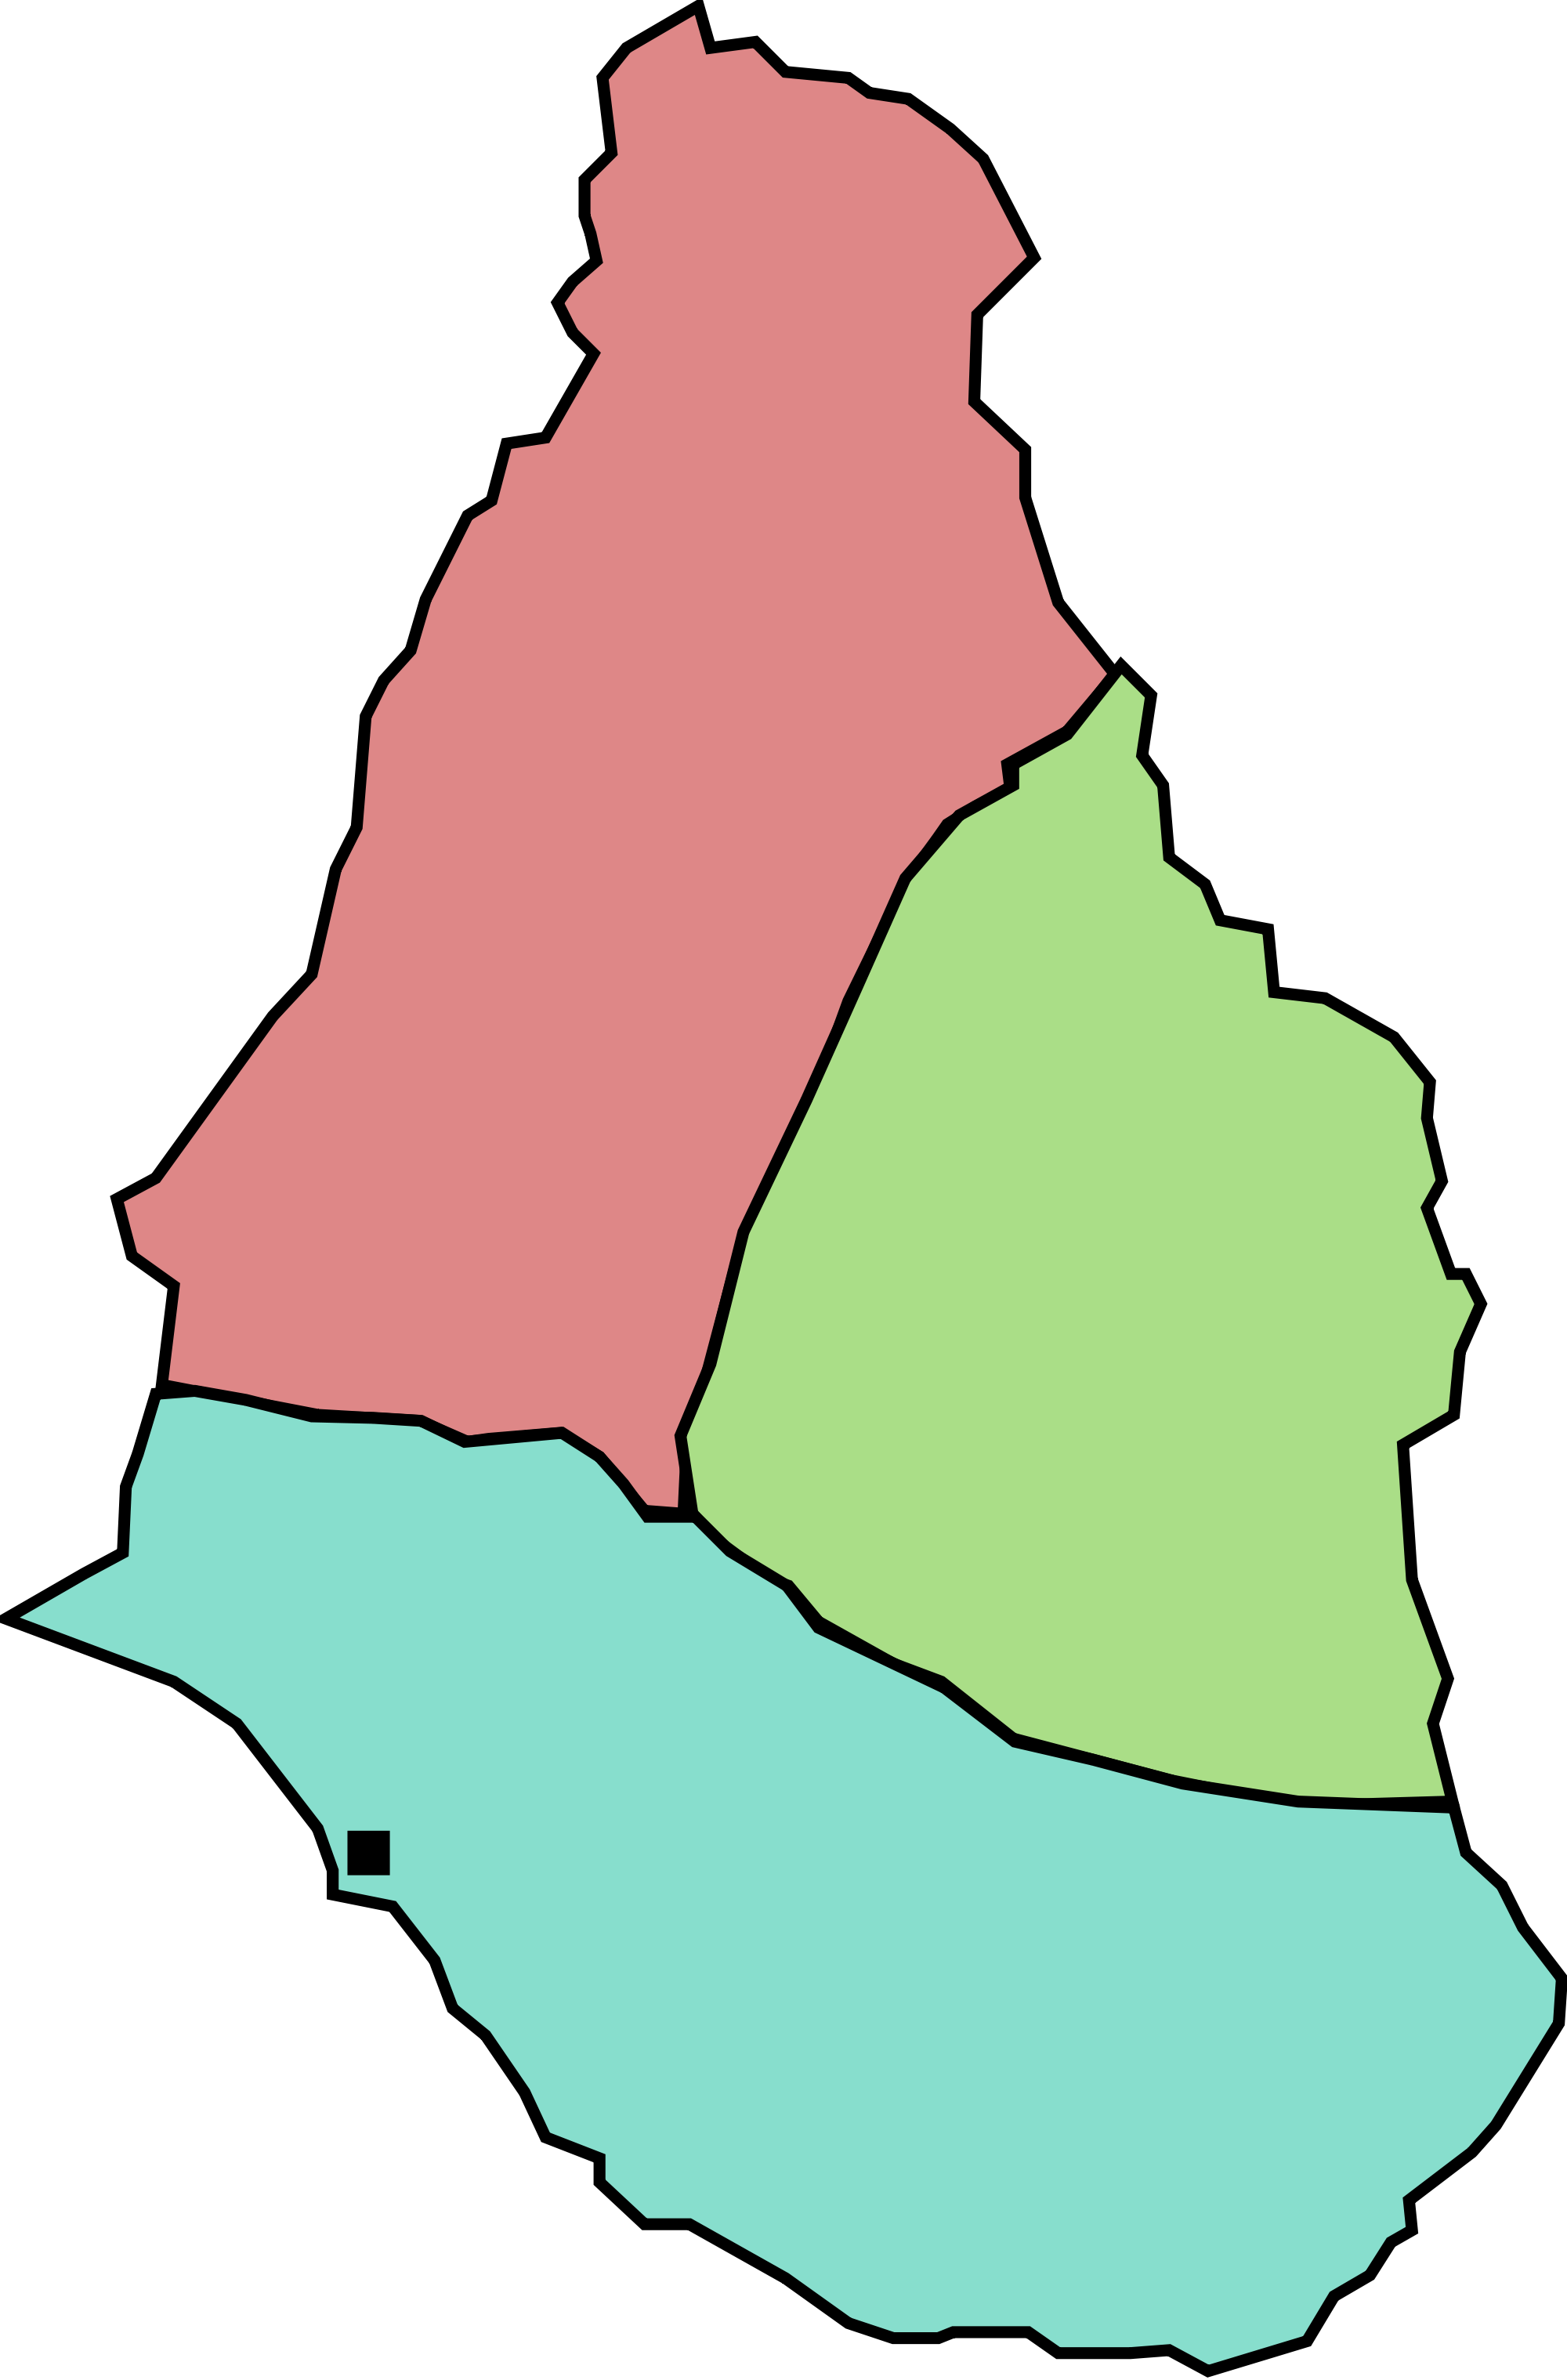 Blank Map Of Montserrat - ClipArt Best